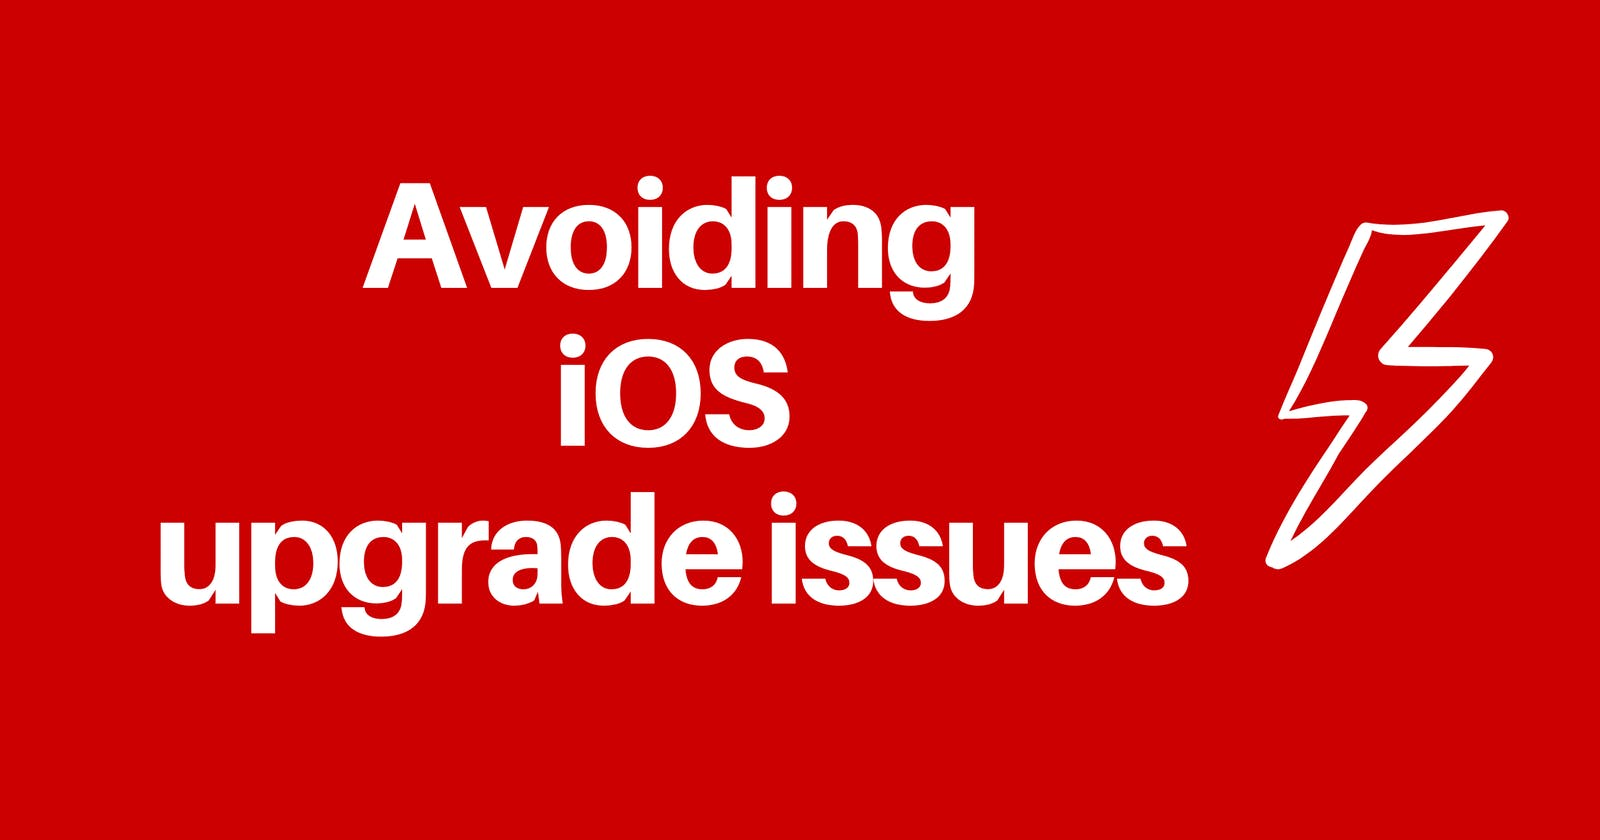 Avoiding iOS upgrade issues